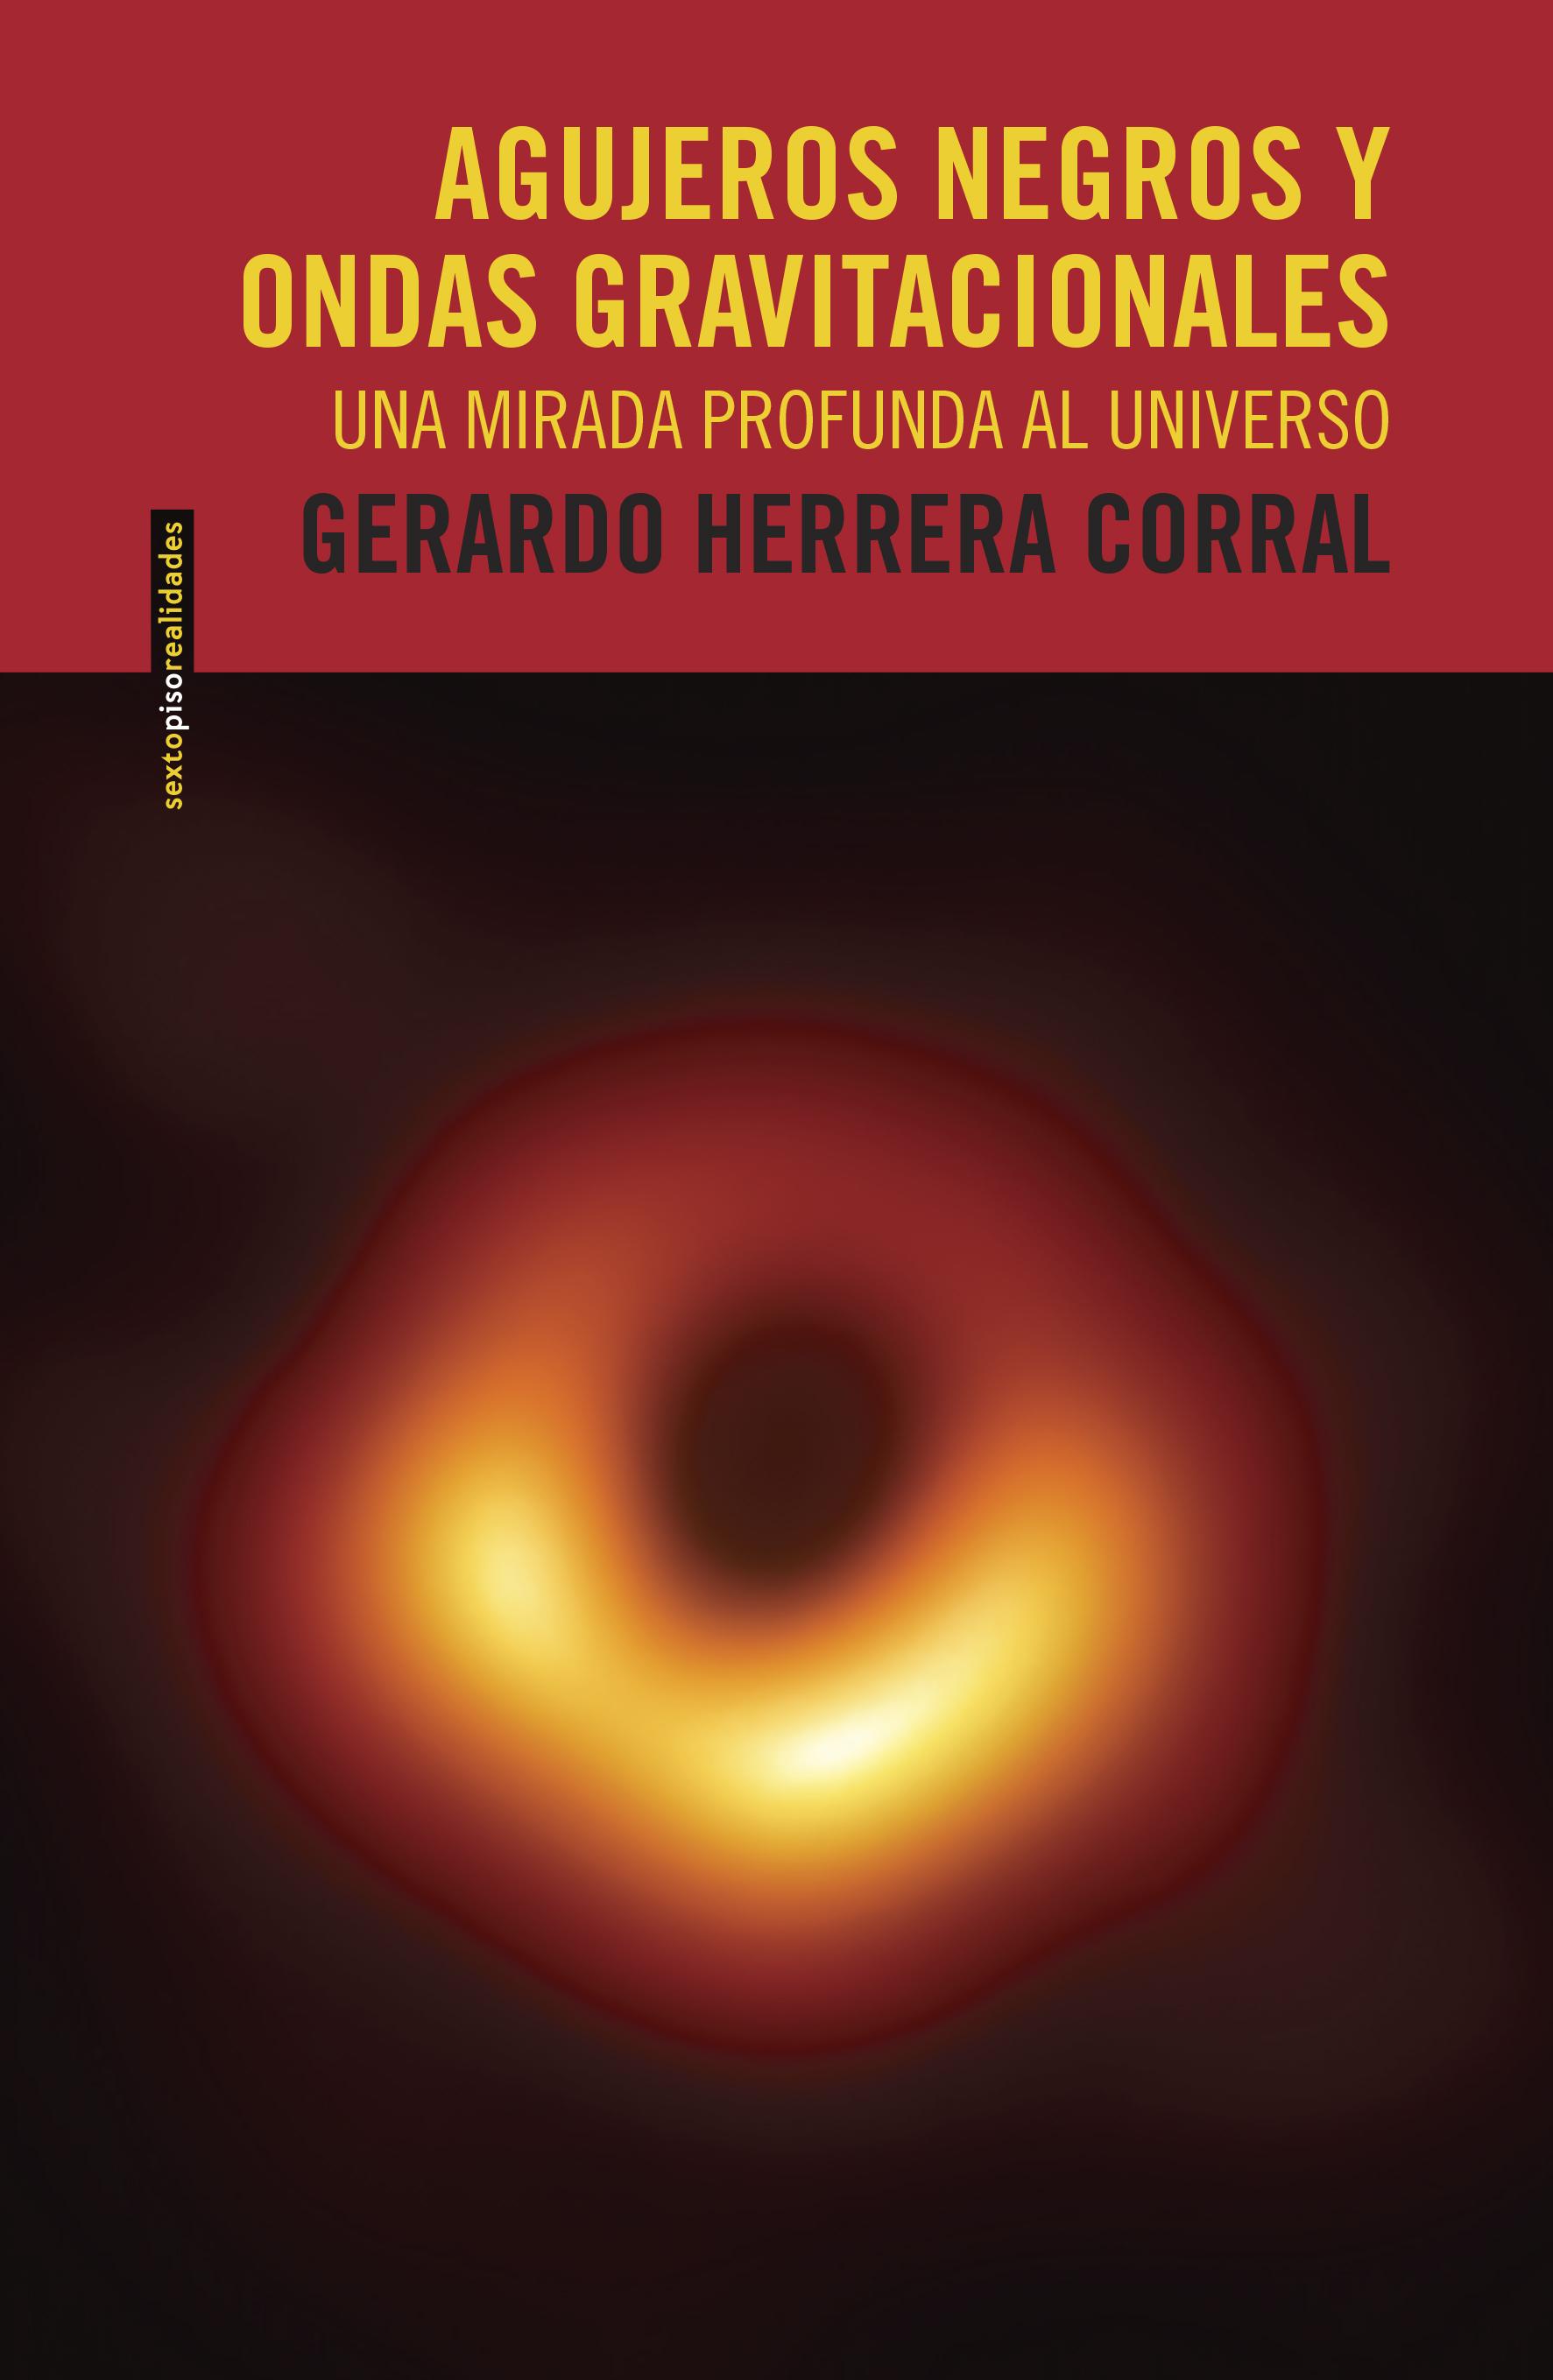 agujeros-negros-y-ondas-gravitac